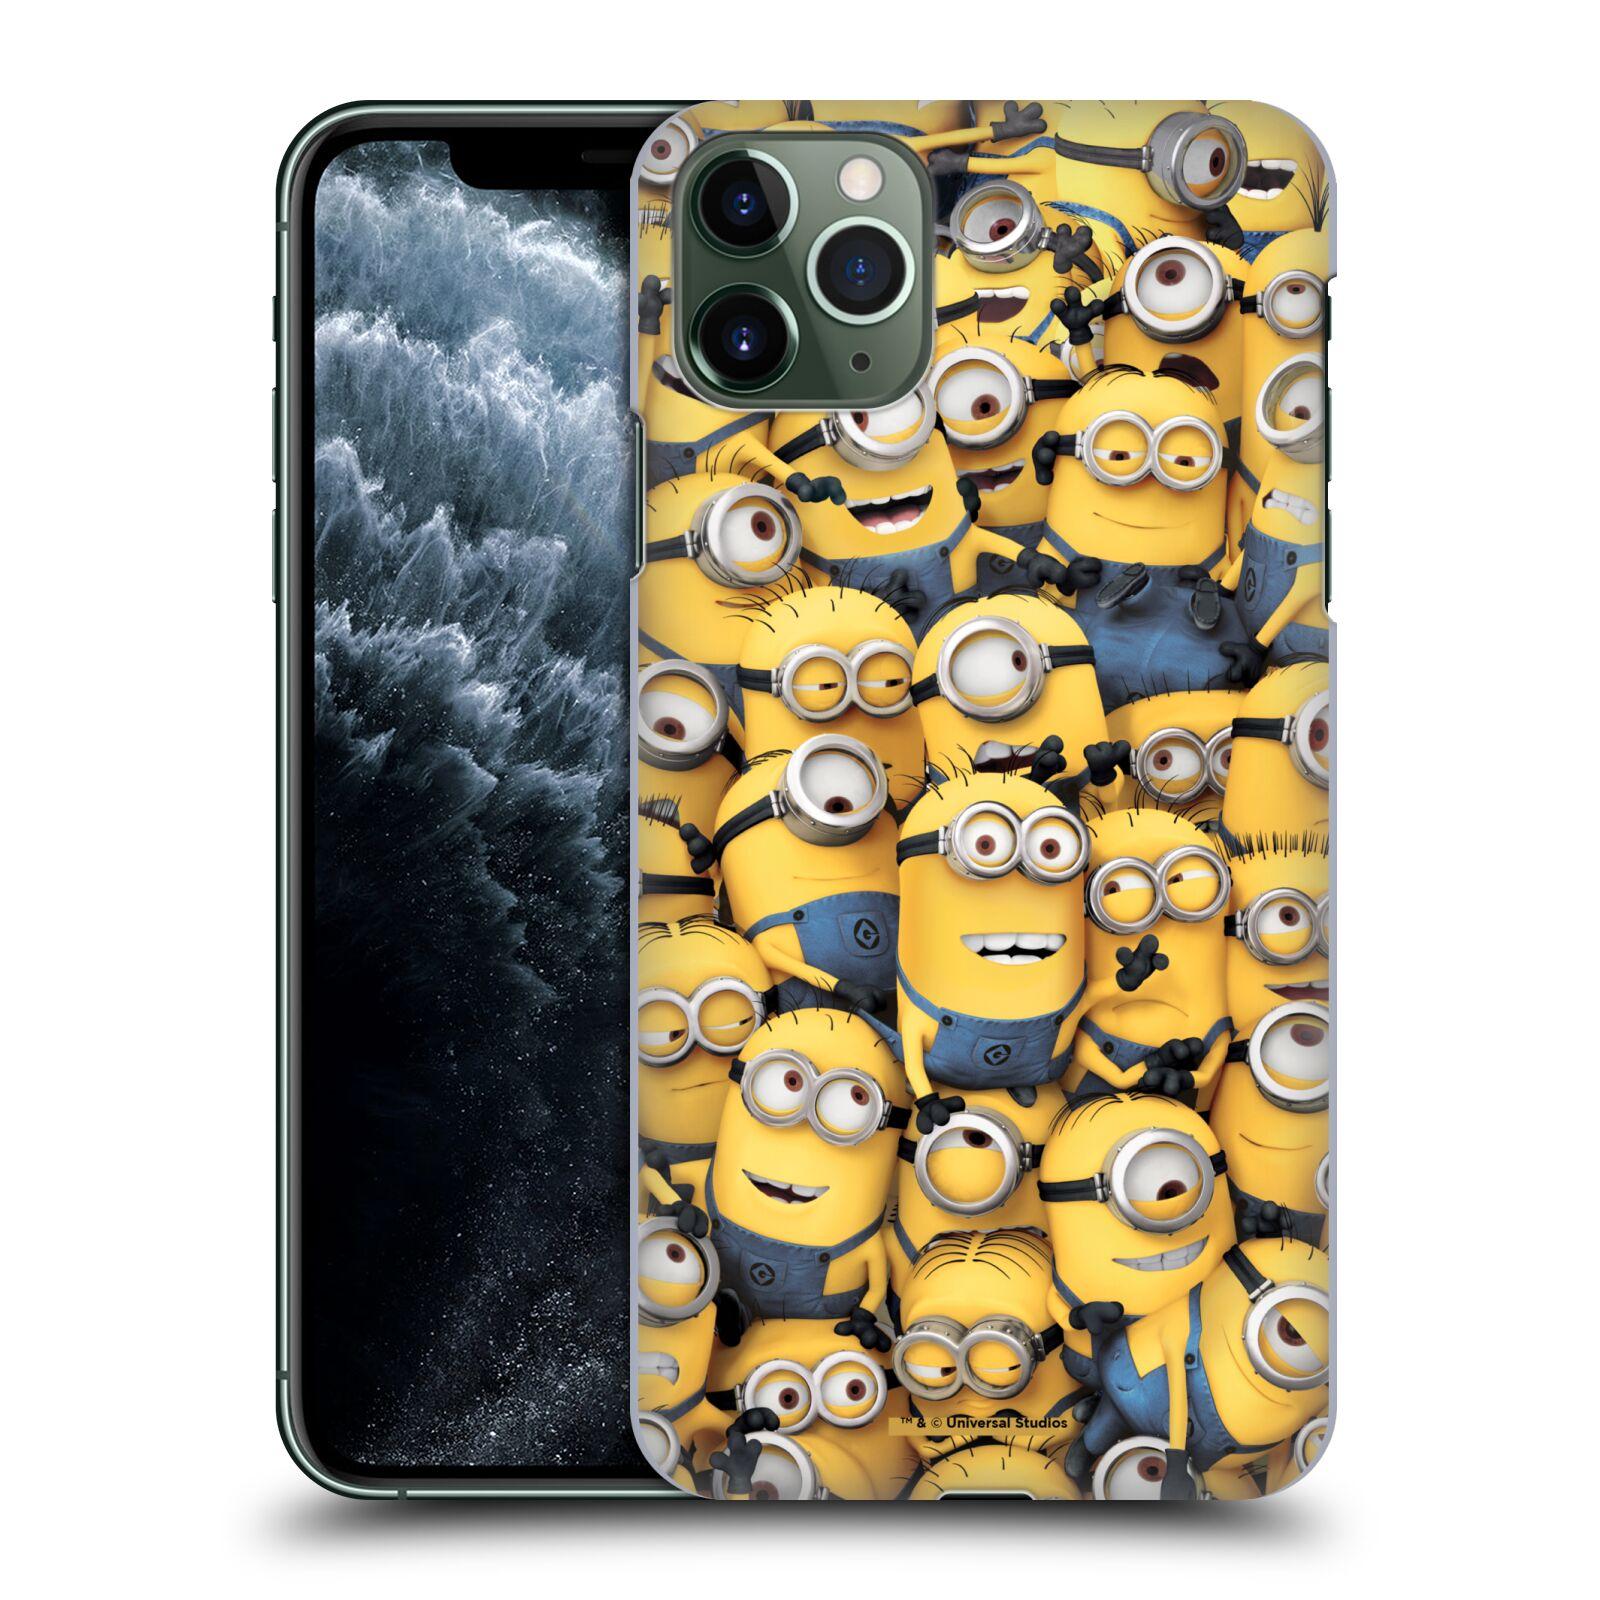 Plastové pouzdro na mobil Apple iPhone 11 Pro Max - Head Case - Mimoni všude z filmu Já, padouch - Despicable Me